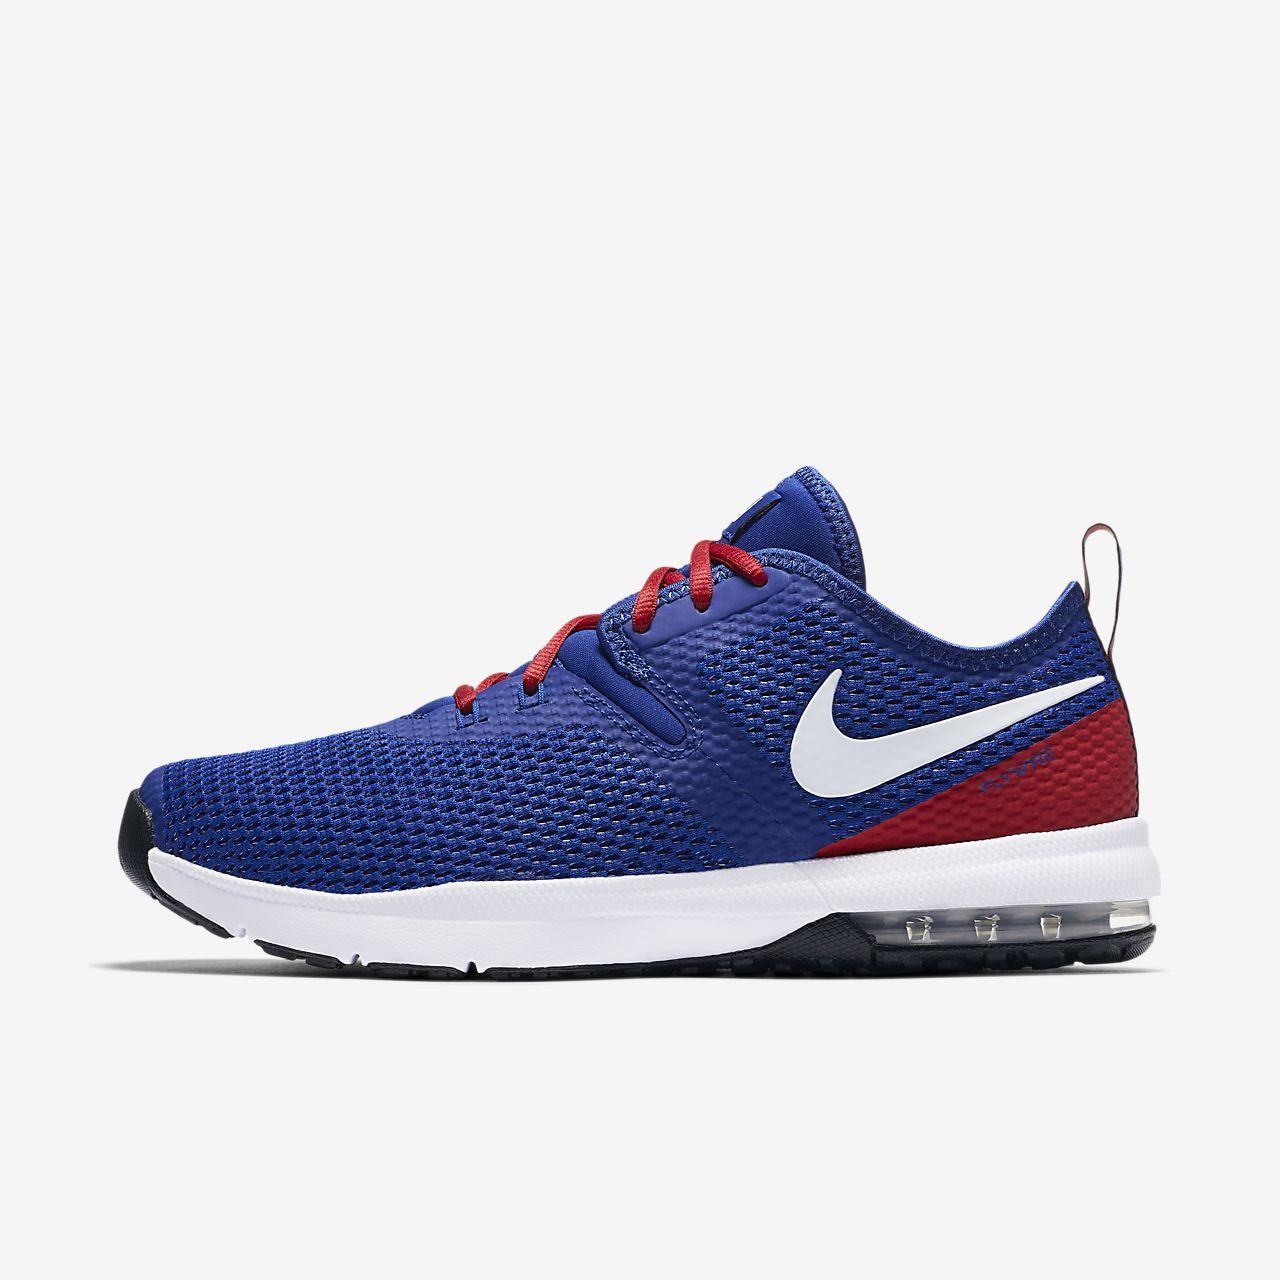 sports shoes 4805a ebafc Nike Air Max Typha 2 (NFL NY Giants)